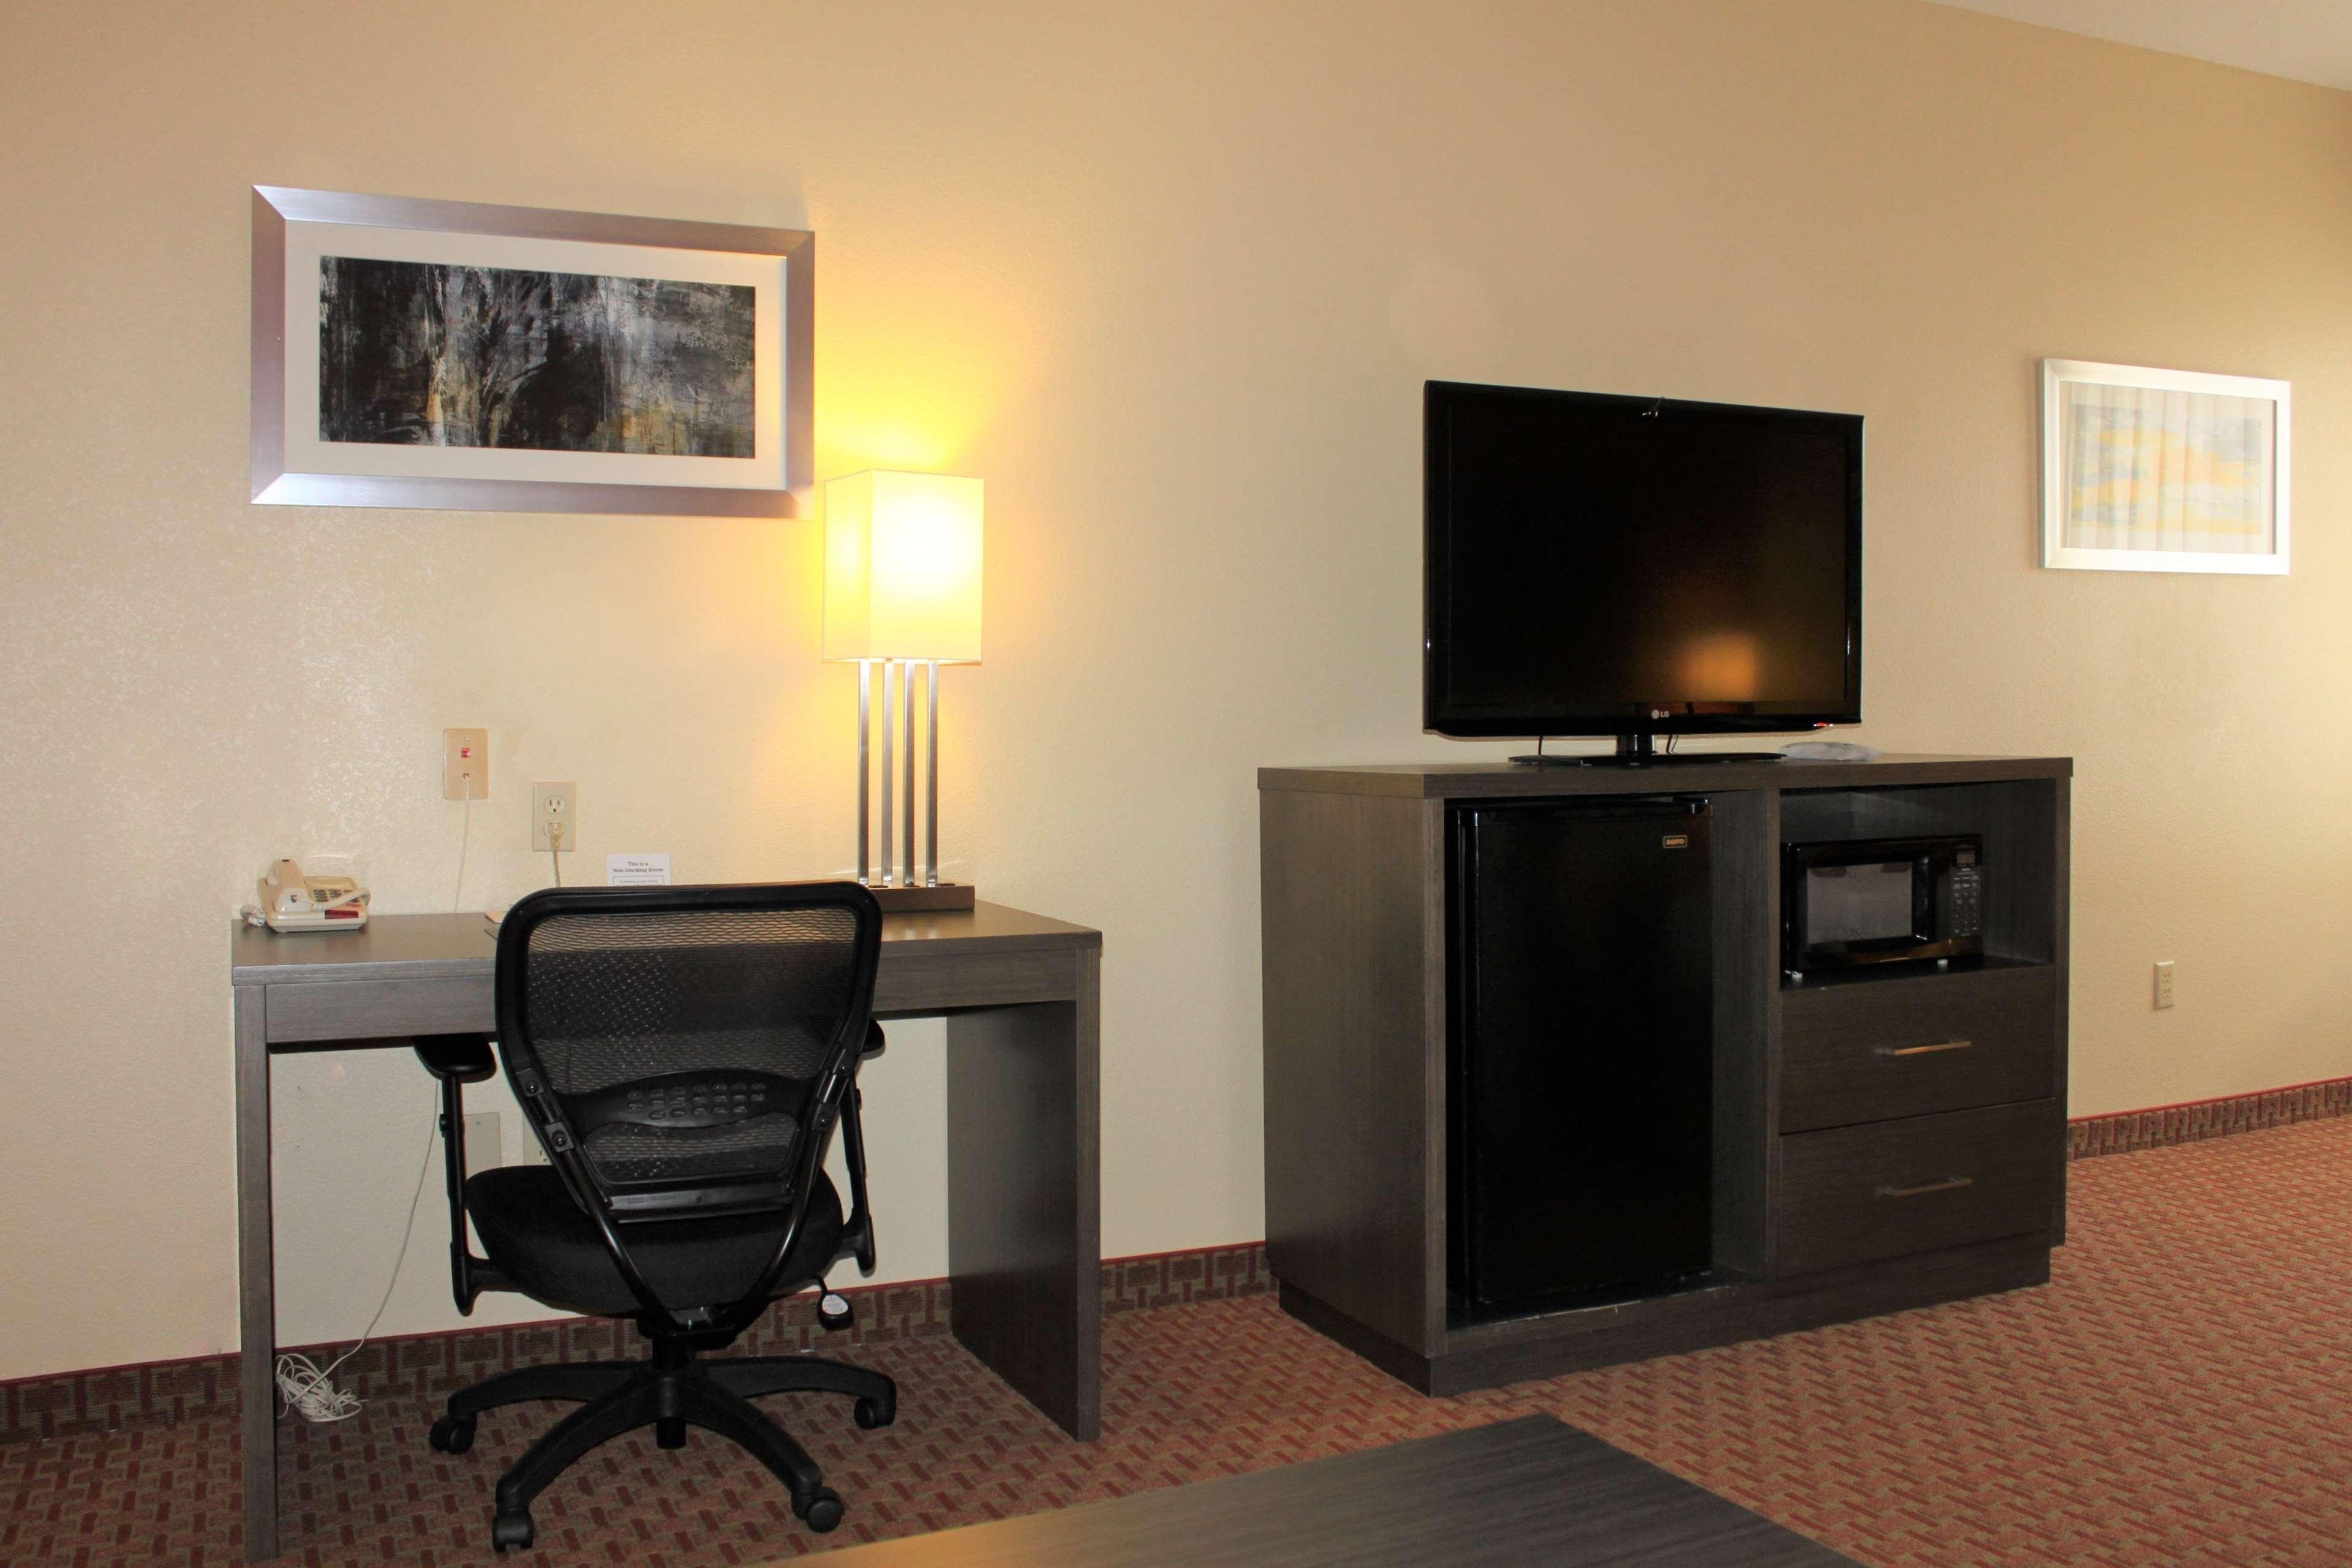 Best Western Plus North Houston Inn & Suites image 19